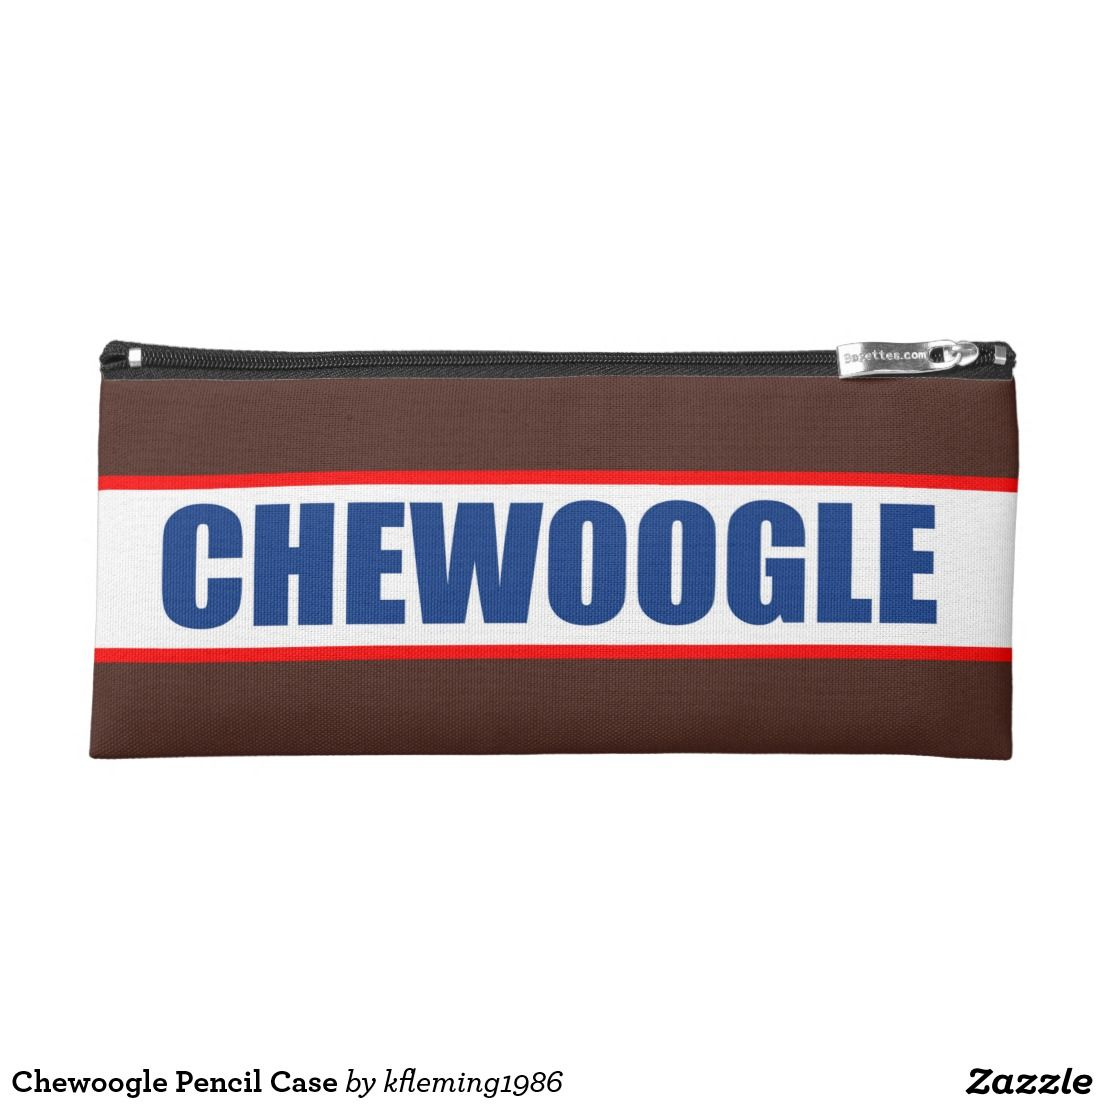 Chewoogle Pencil Case